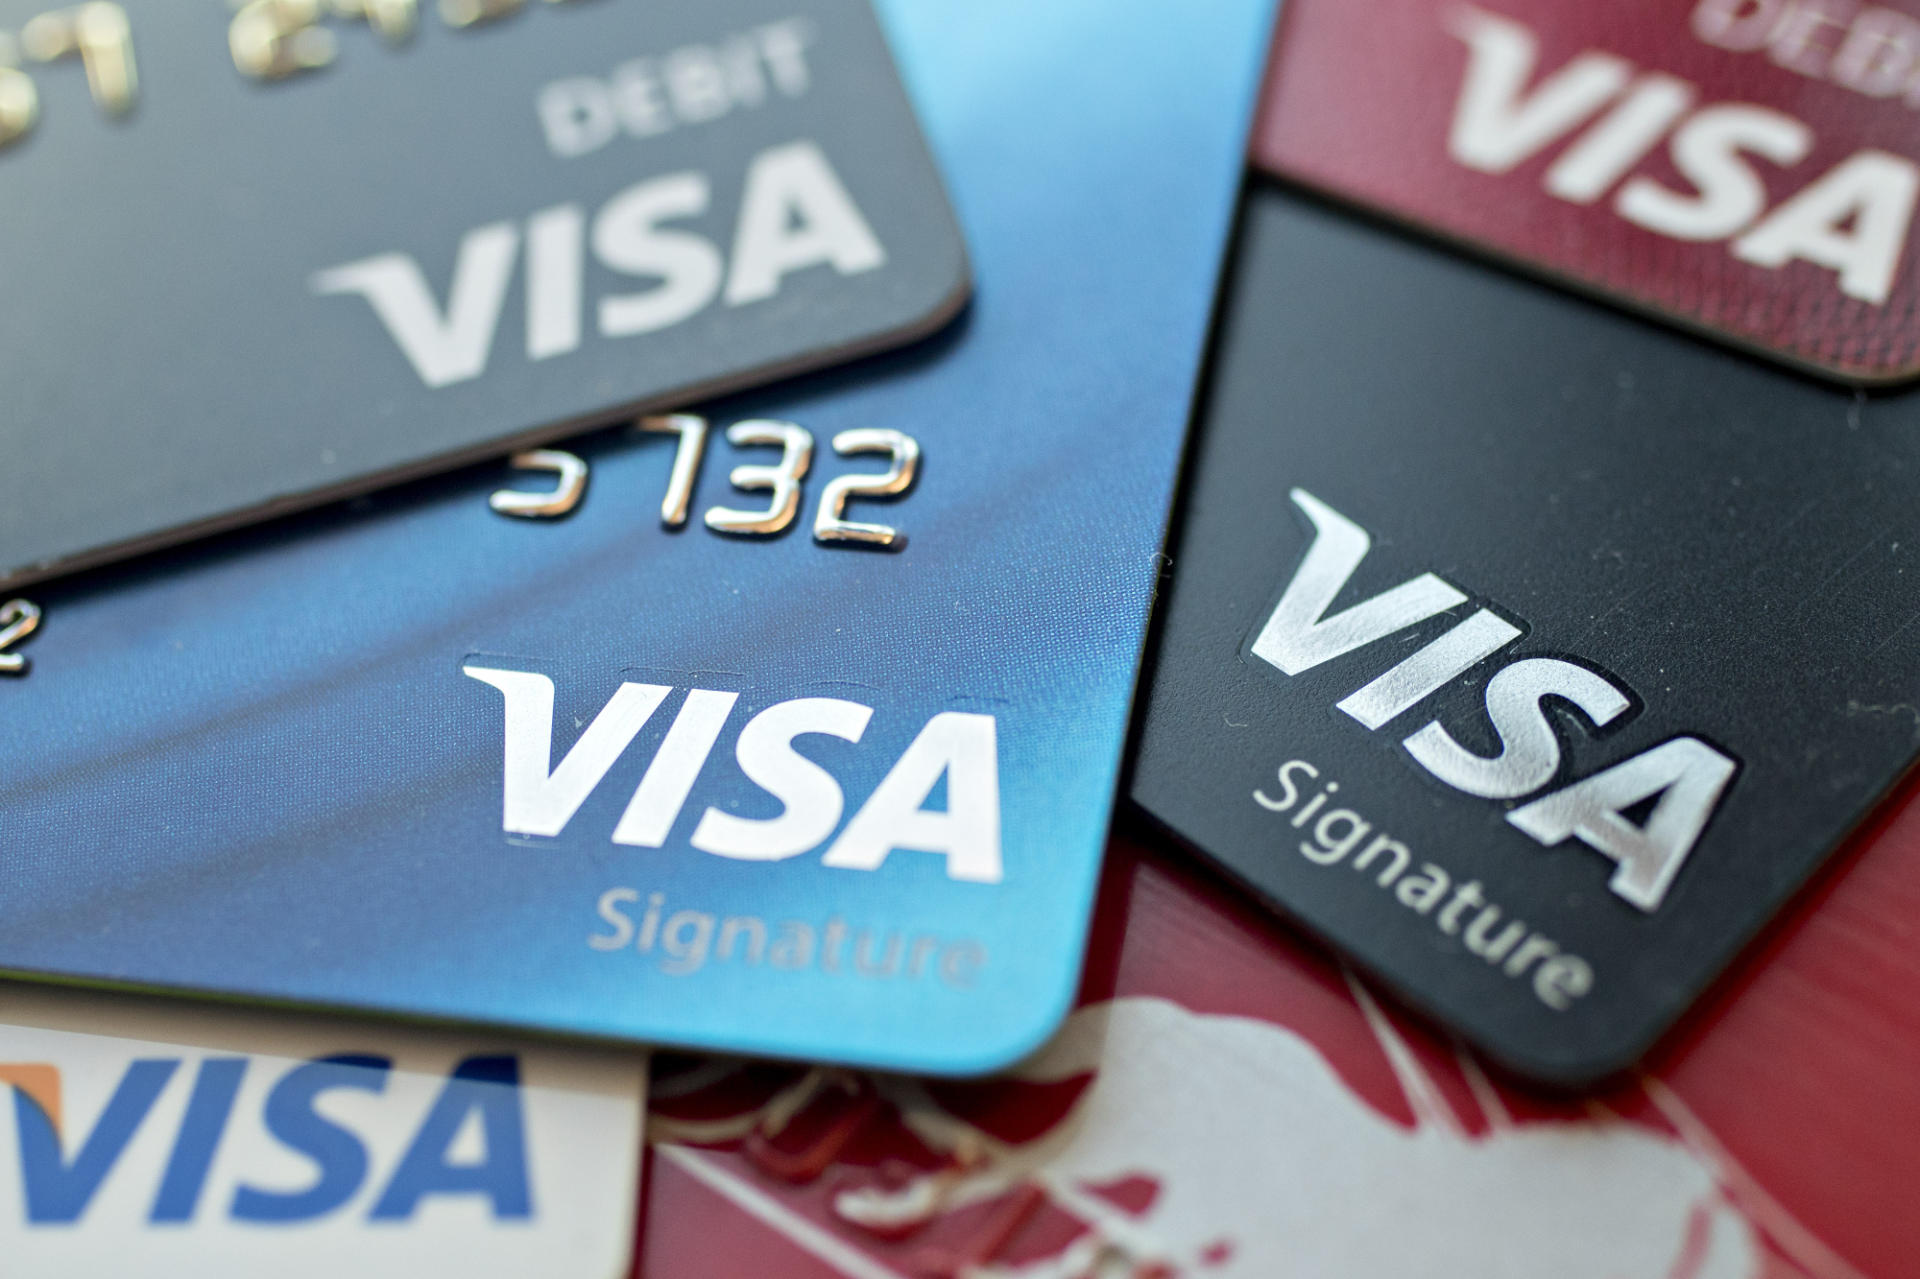 2021/06/visa_cards_210120_1623322080.jpg